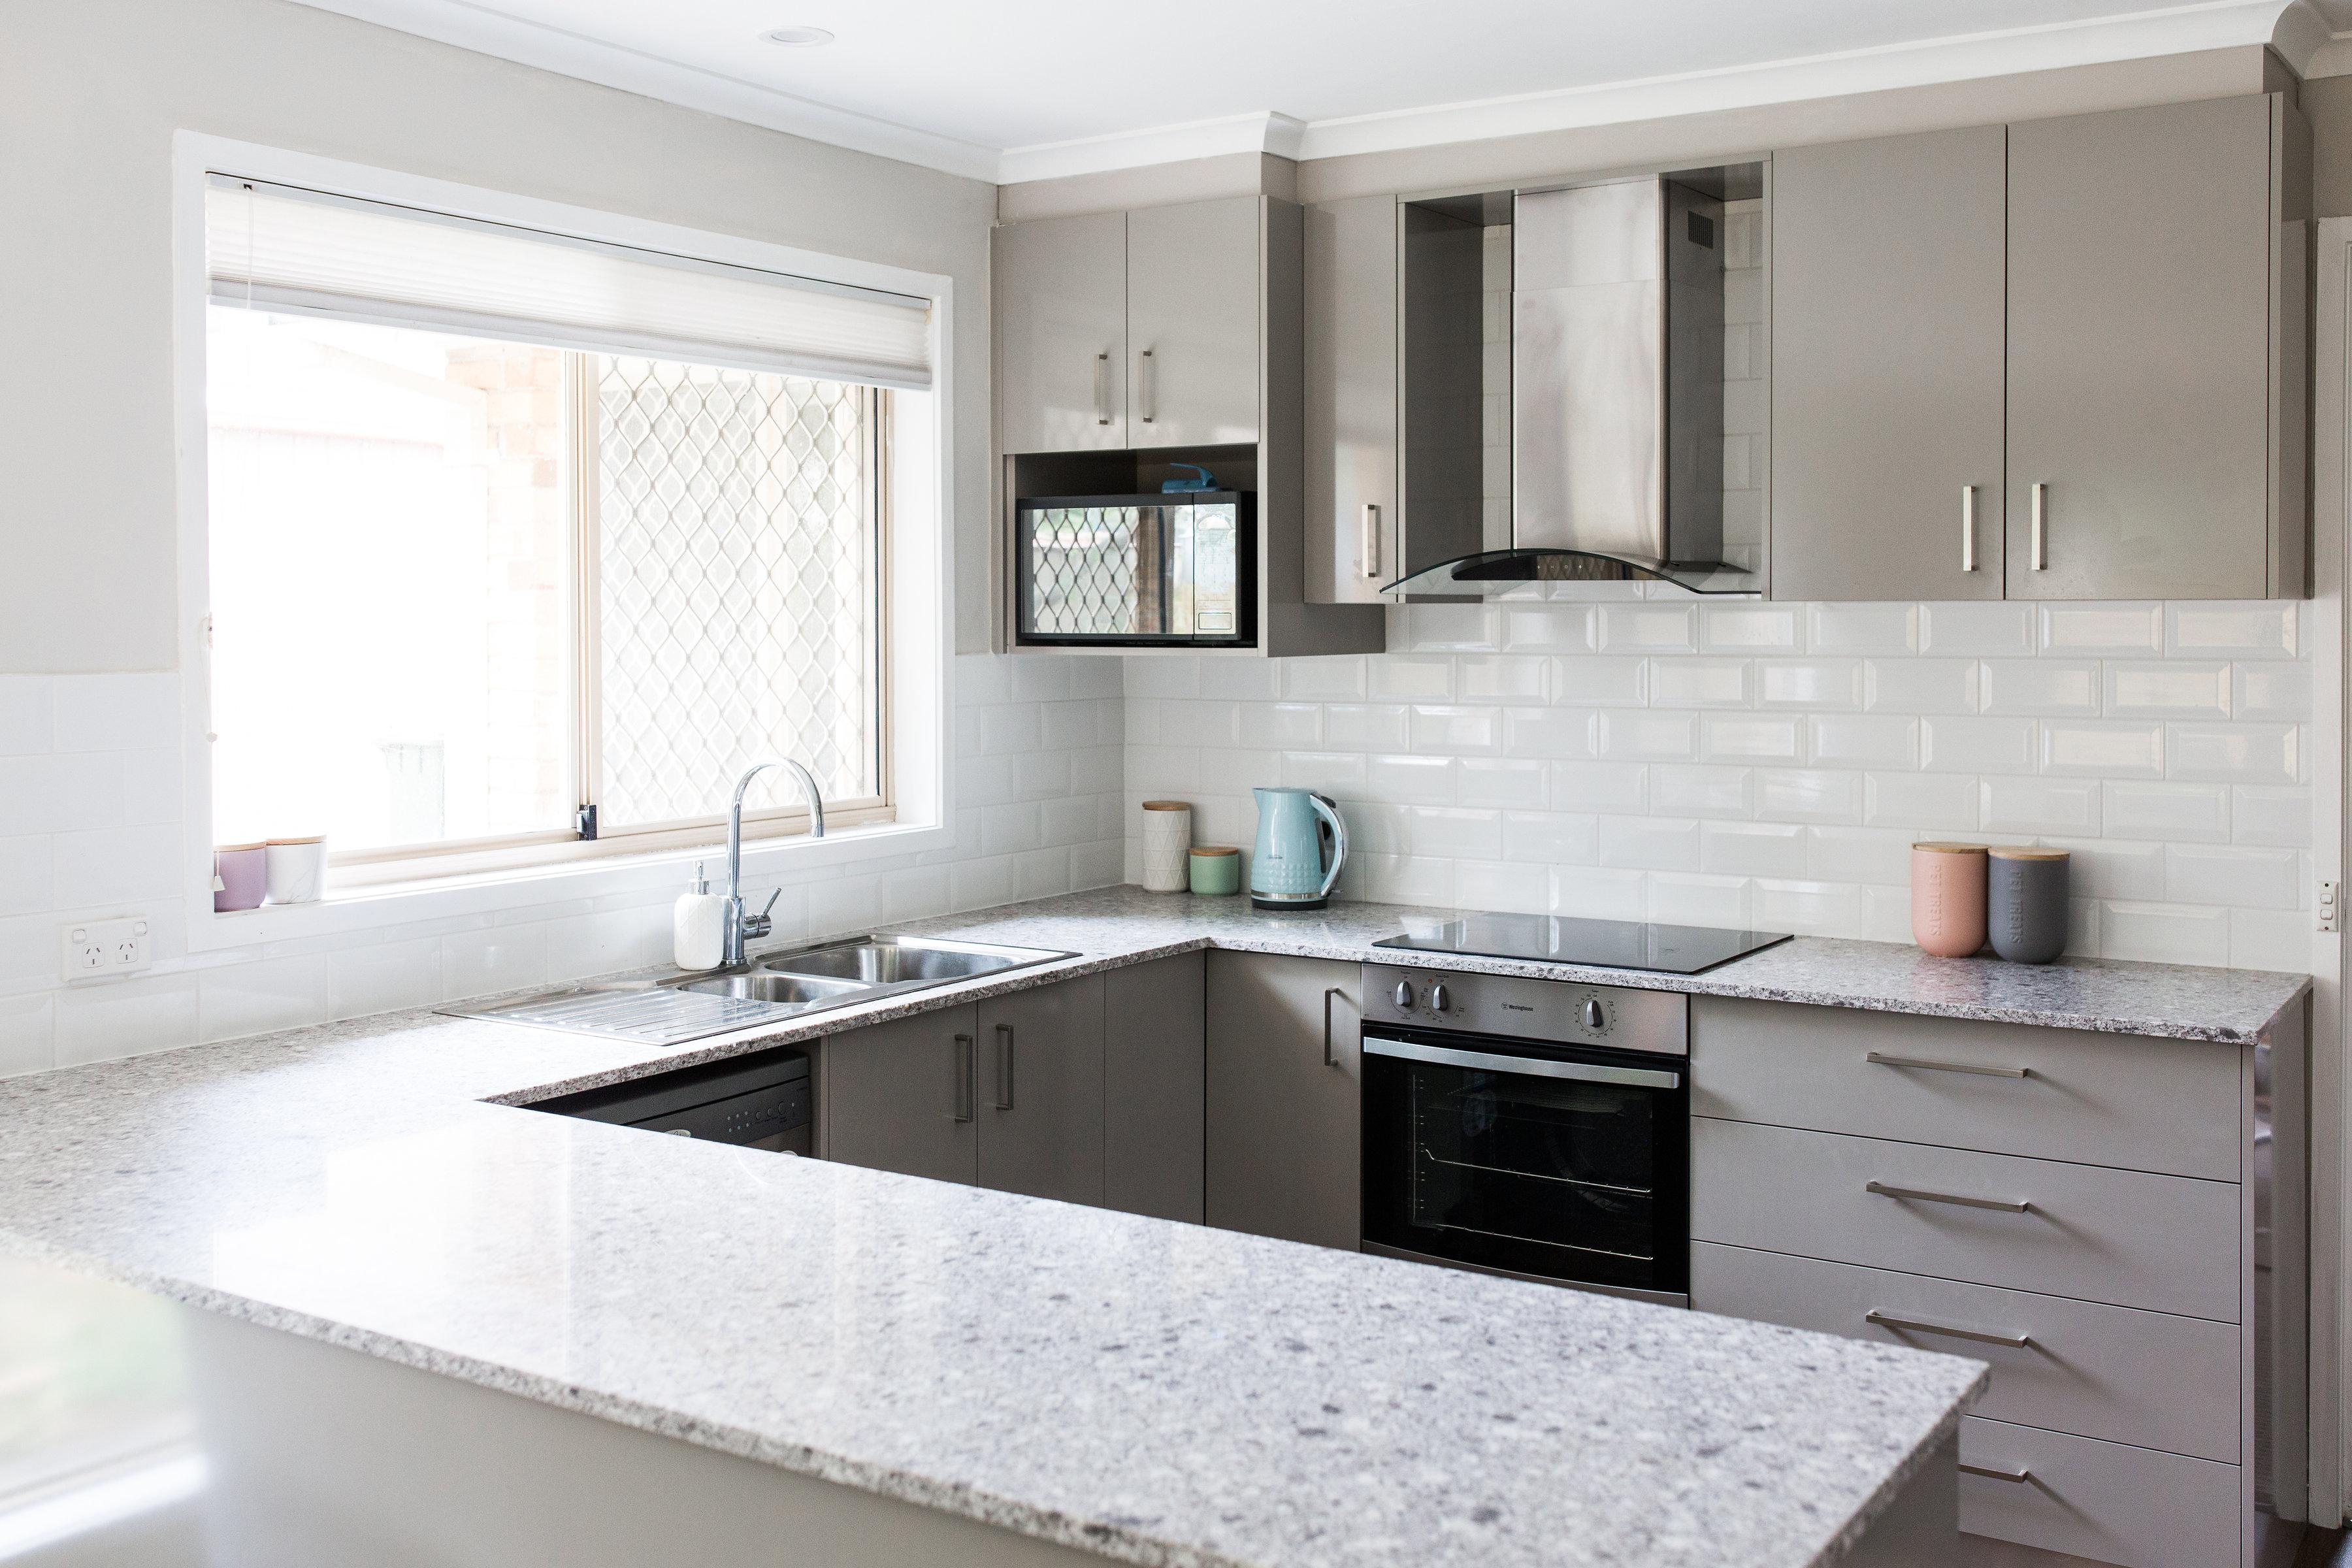 Suburban cottage kitchen